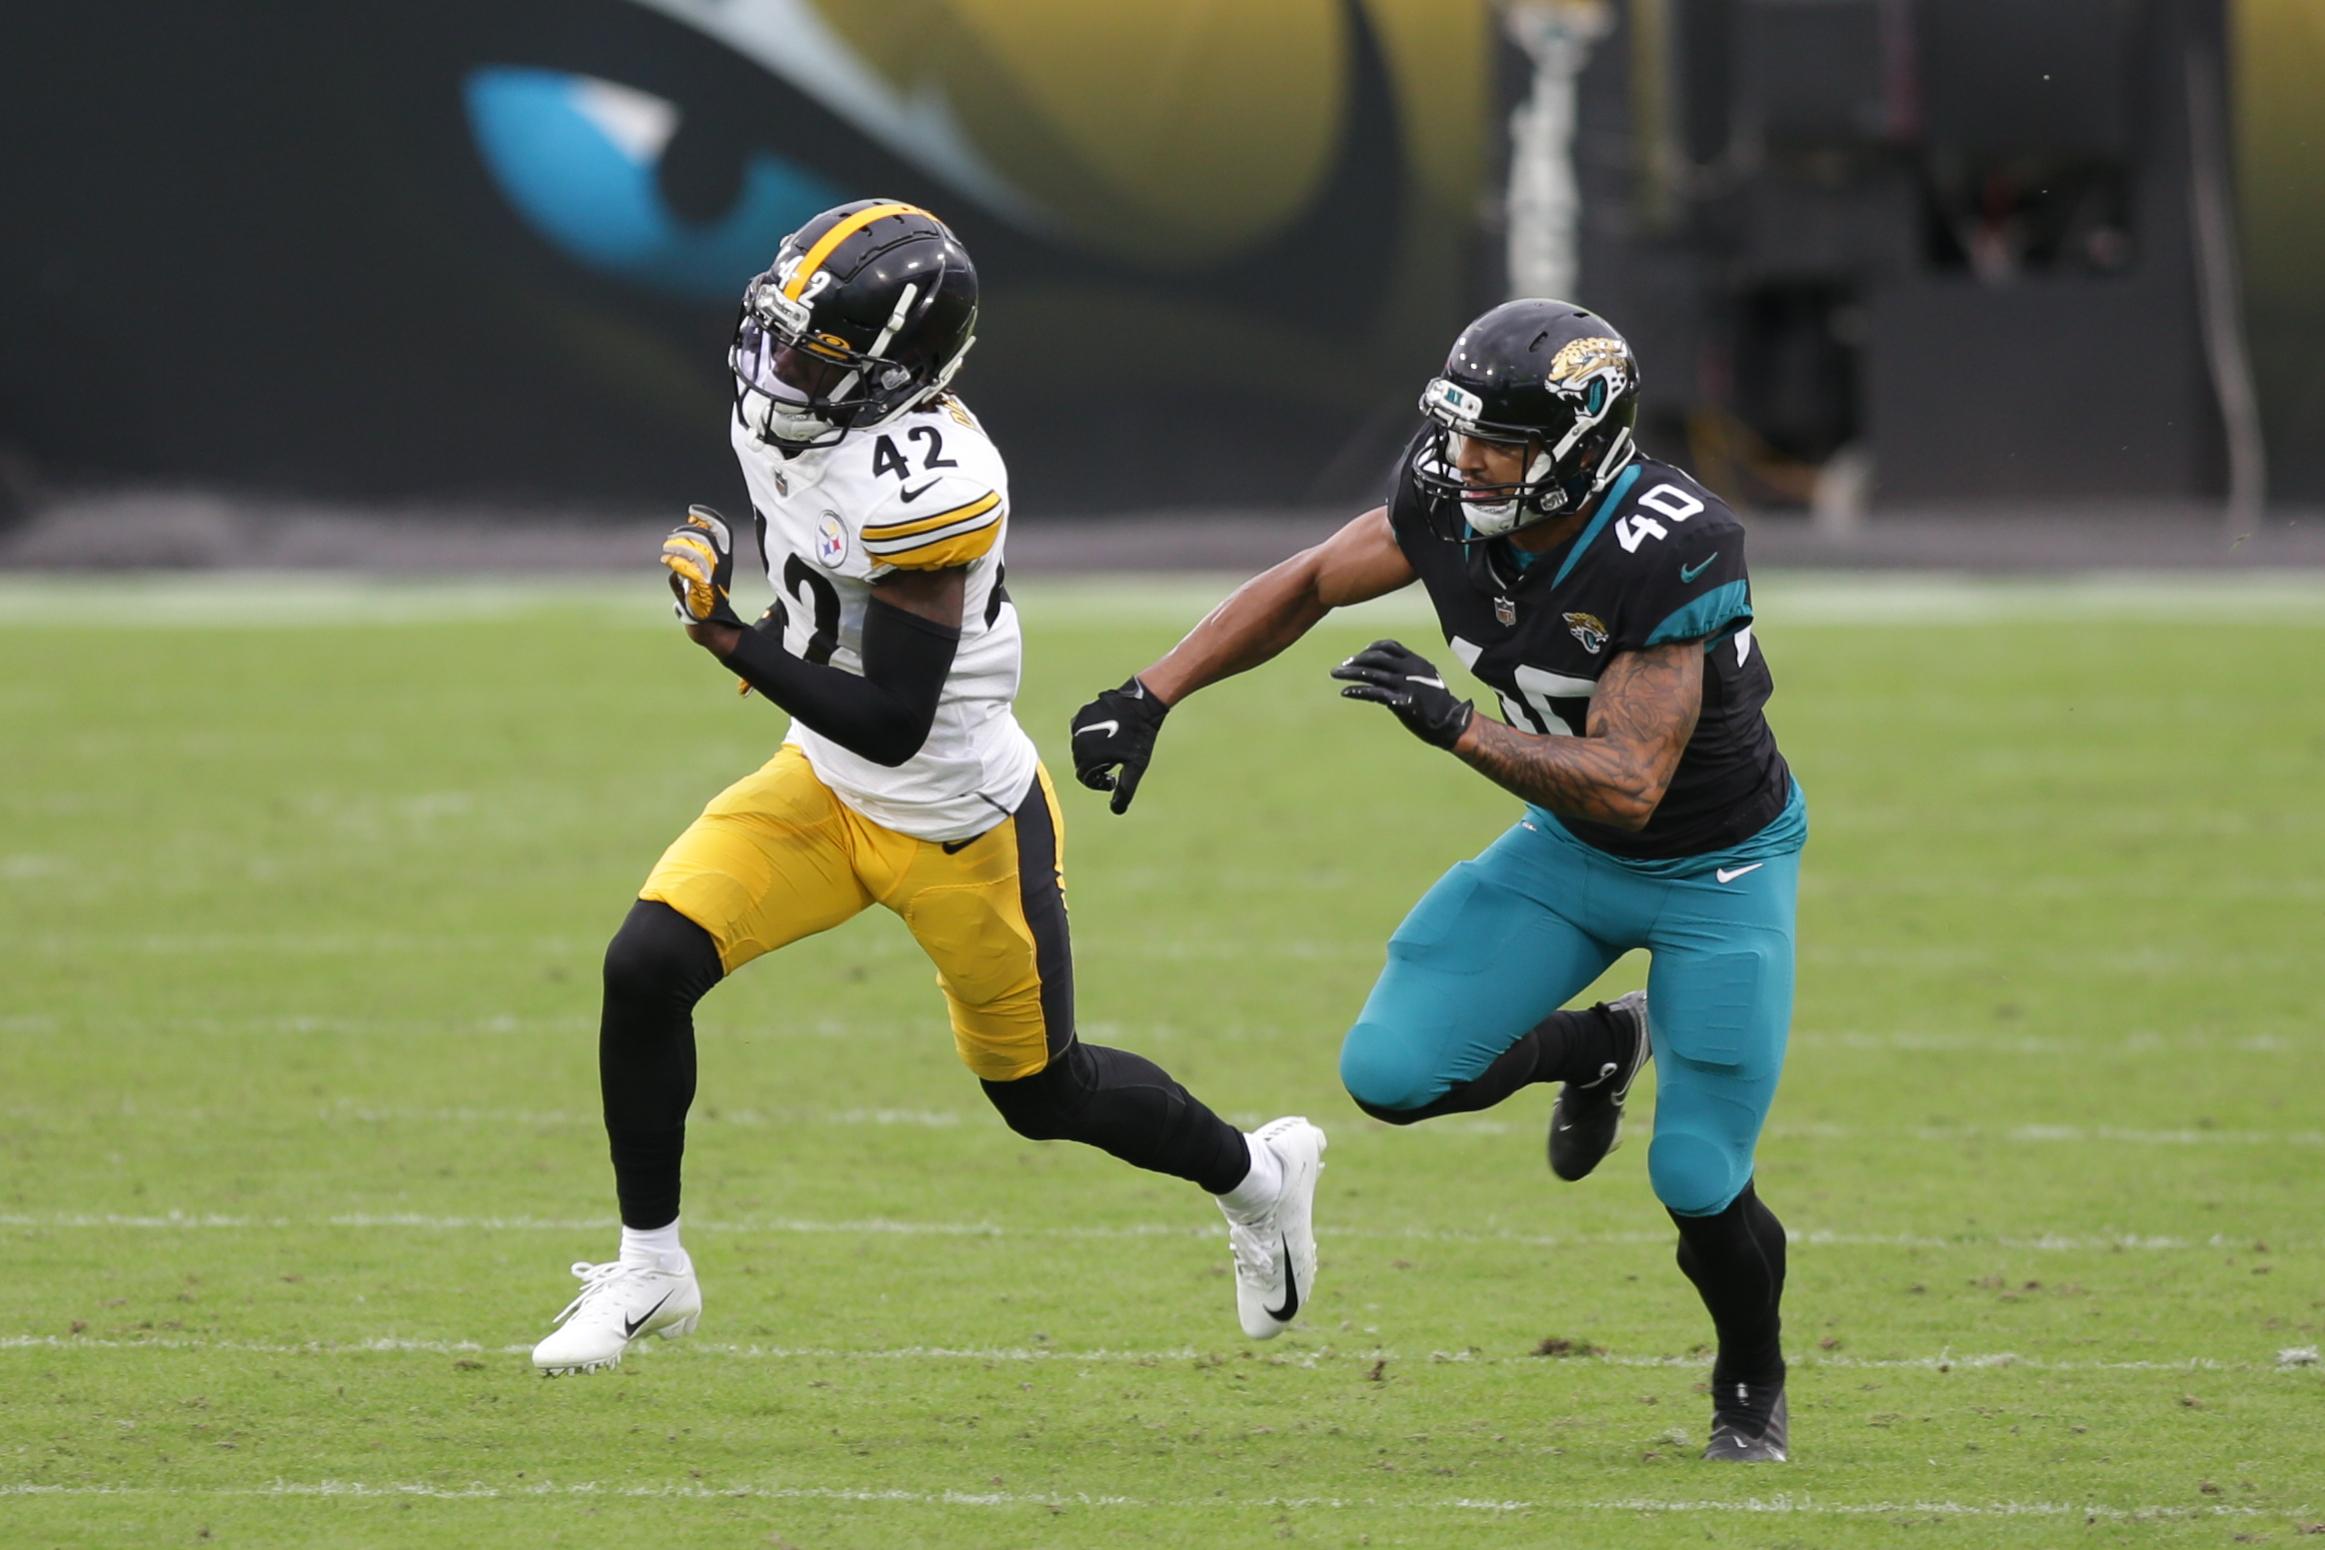 NFL: 11月22日钢人队在捷豹队